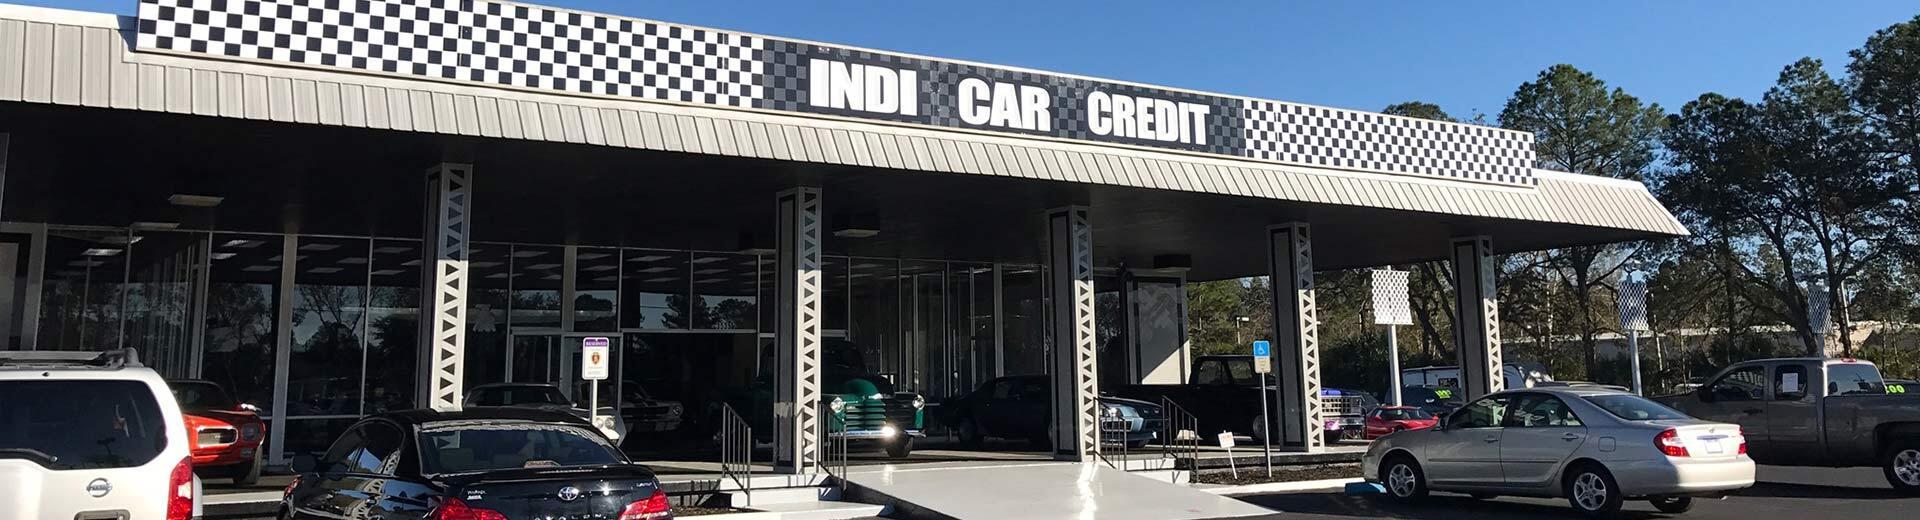 Used car dealership gainesville fl used cars indi car credit